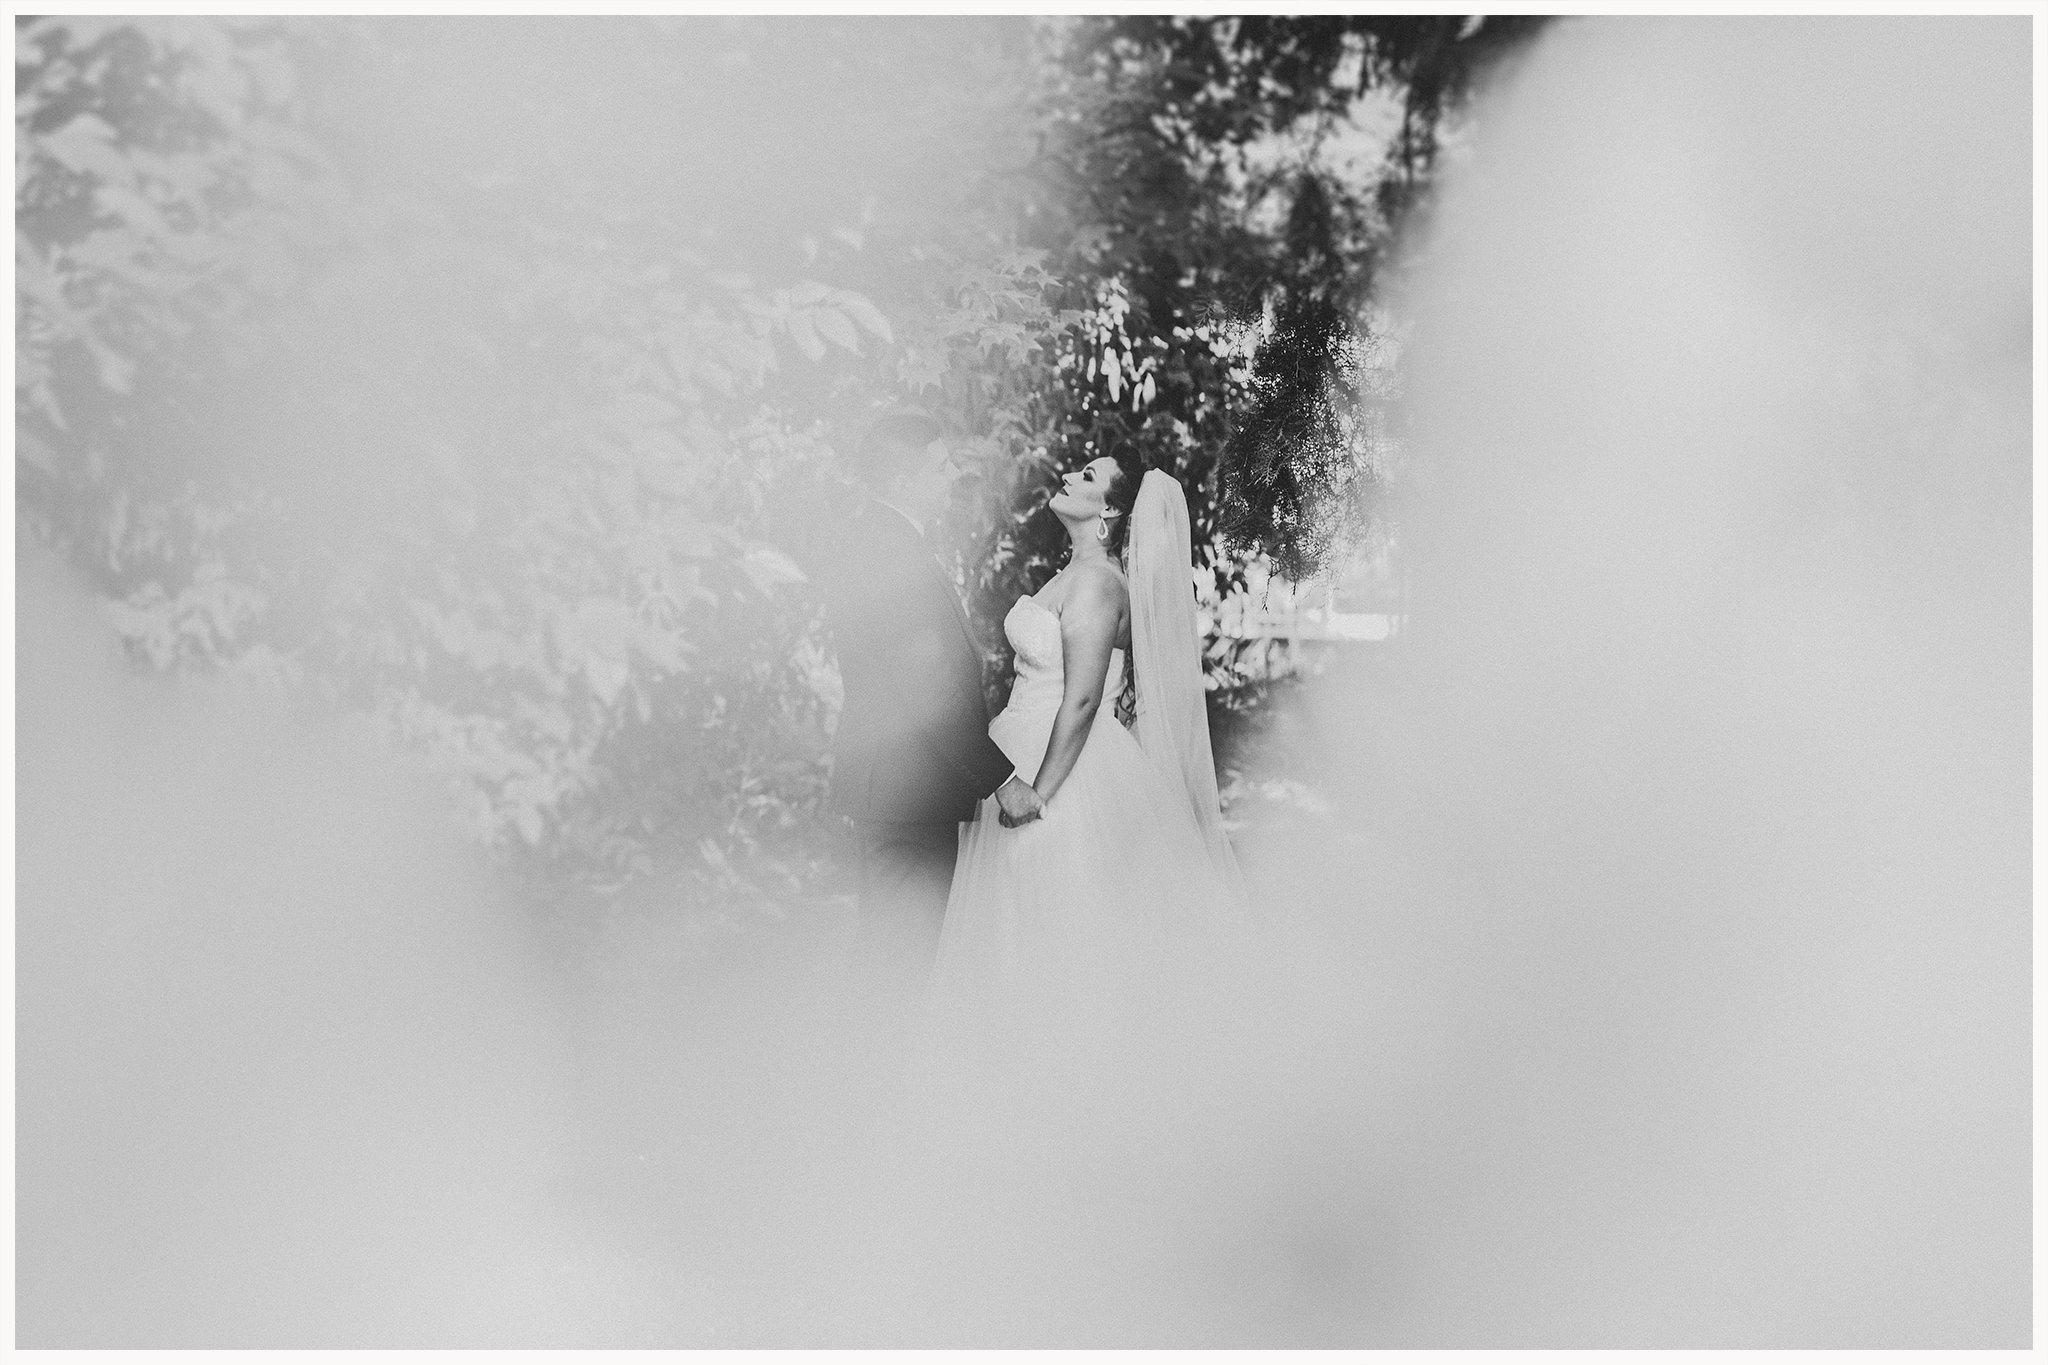 www.dreamsanddreamers.com-fotograf-nunta-timisoara-diana-sebastian-423.jpg